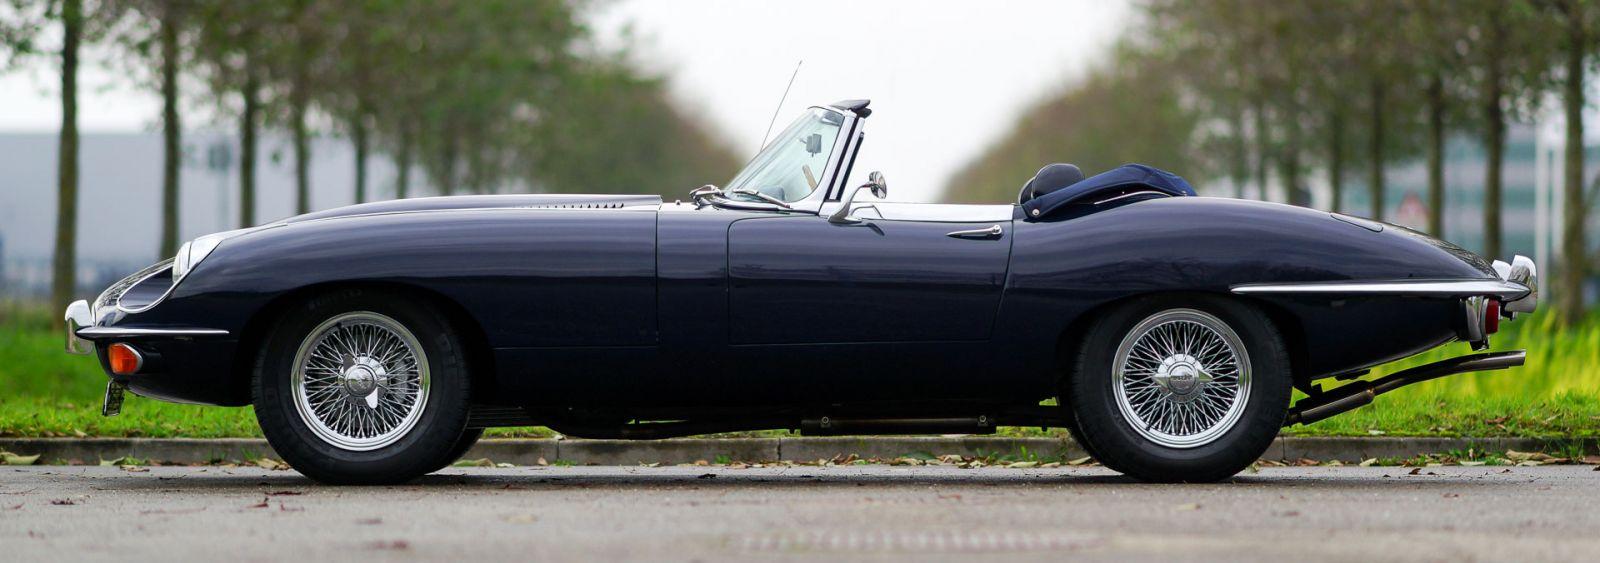 Jaguar E Type 42 Litre Ots 1970 Welcome To Classicargarage Xj6 Blue Interior